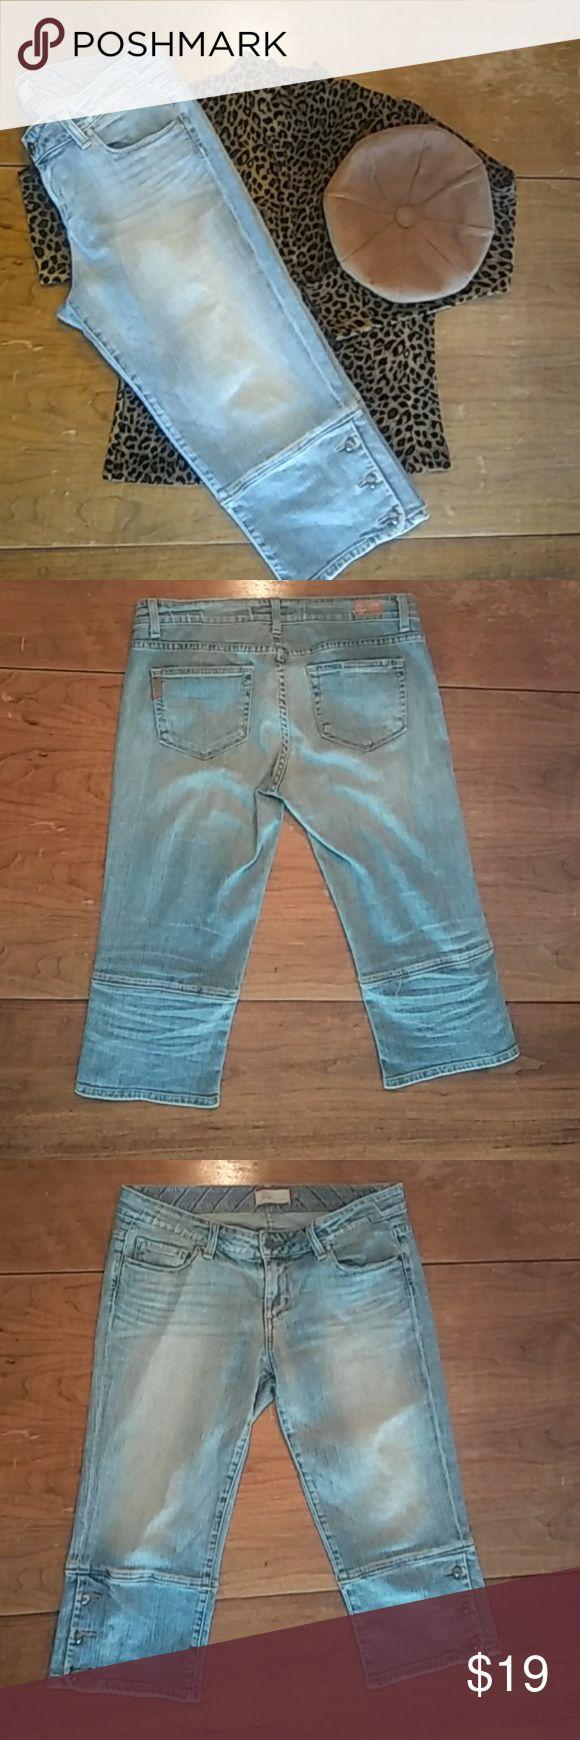 Selling this 💥SALE💥Paige premium denim on Poshmark! My username is: brandwynne. #shopmycloset #poshmark #fashion #shopping #style #forsale #Paige premium denim #Denim